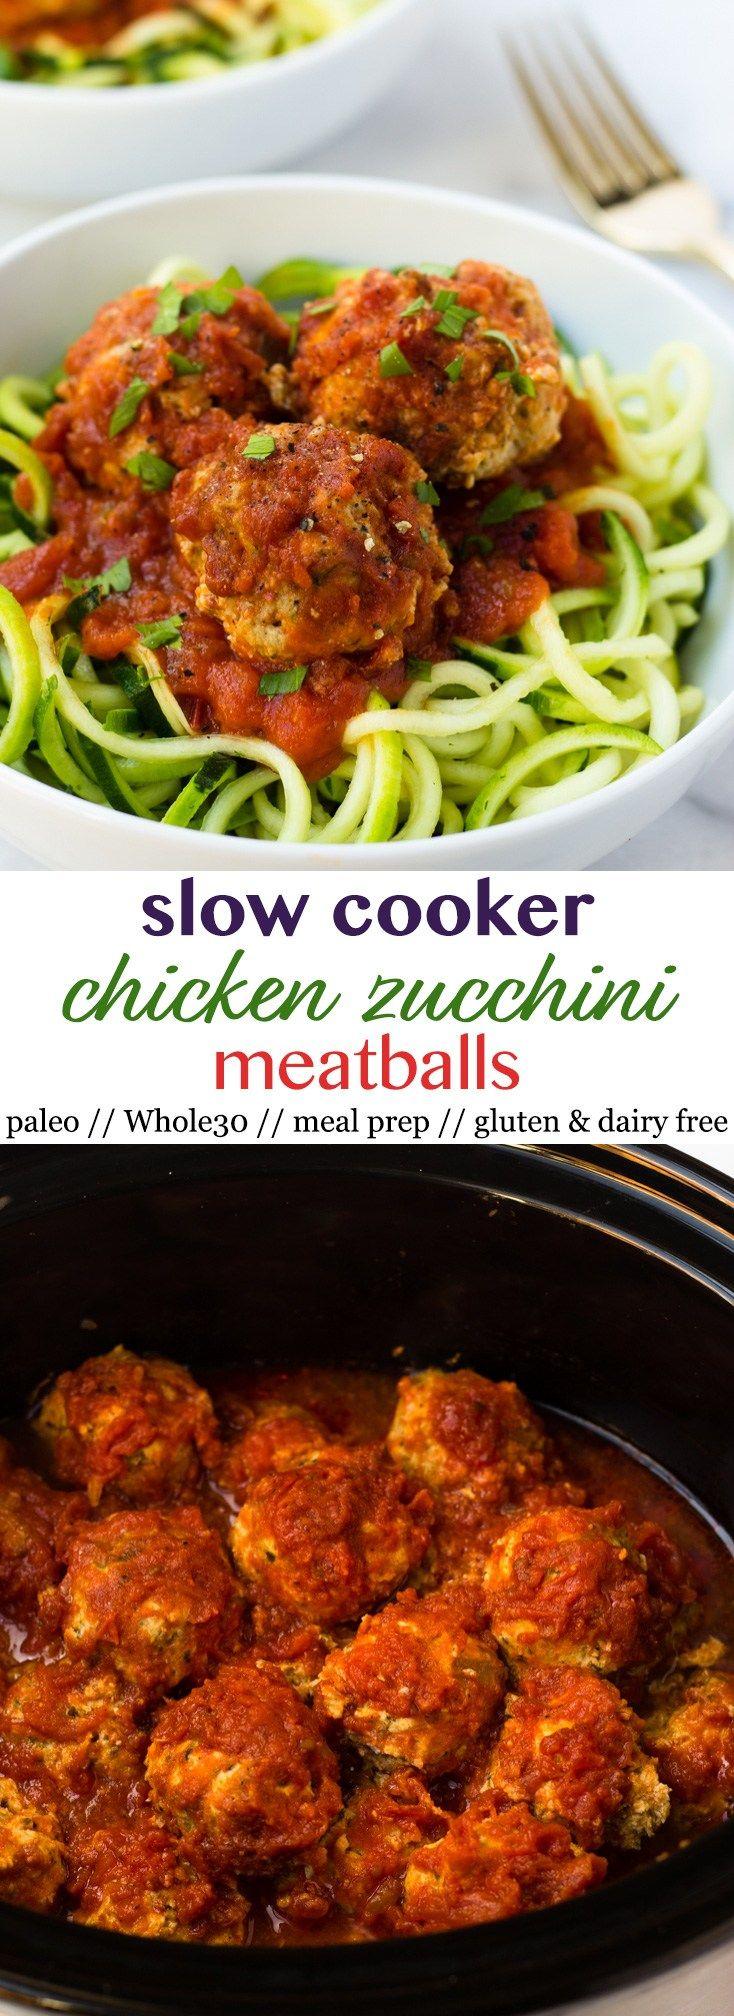 Slow Cooker Chicken Zucchini Meatballs Pinterest Image